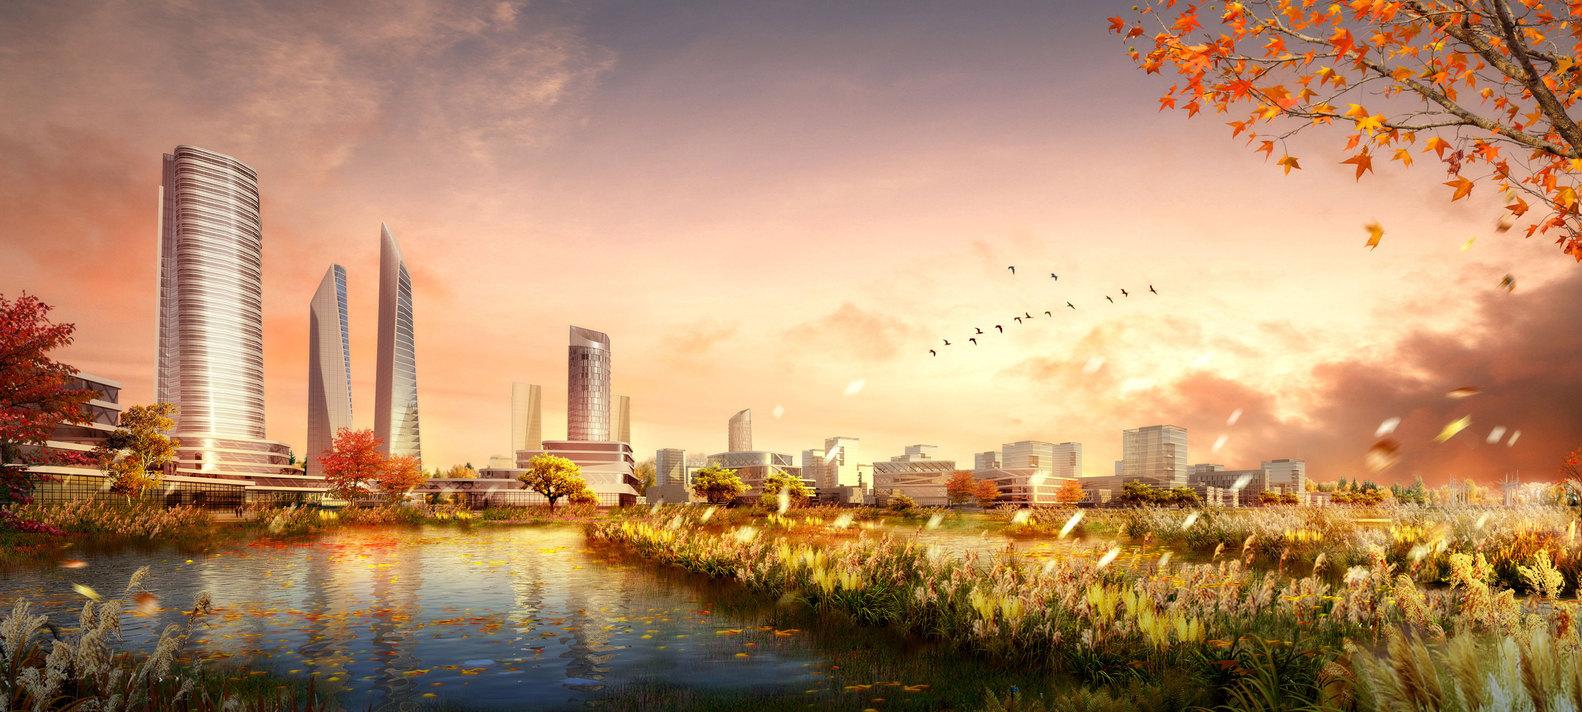 aaupc-patrick-chavannes-nanjing-ecologic